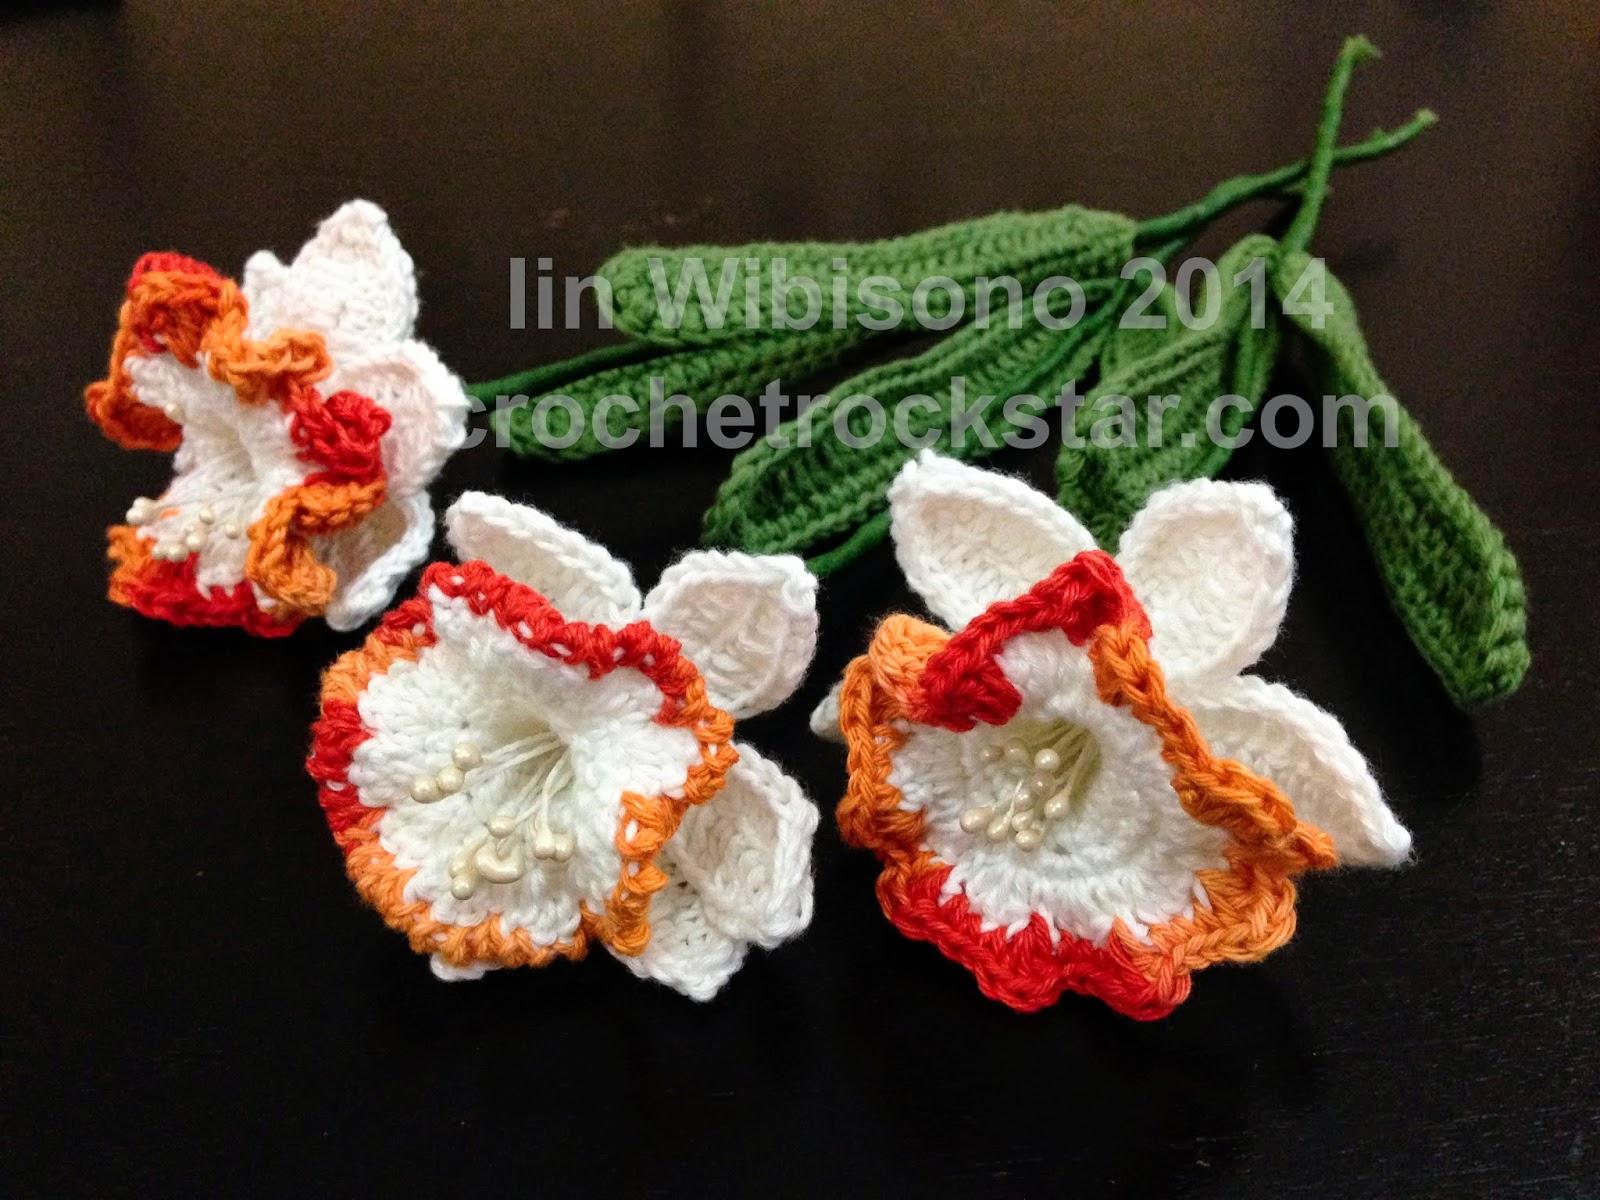 Daffodil Crochet Pattern